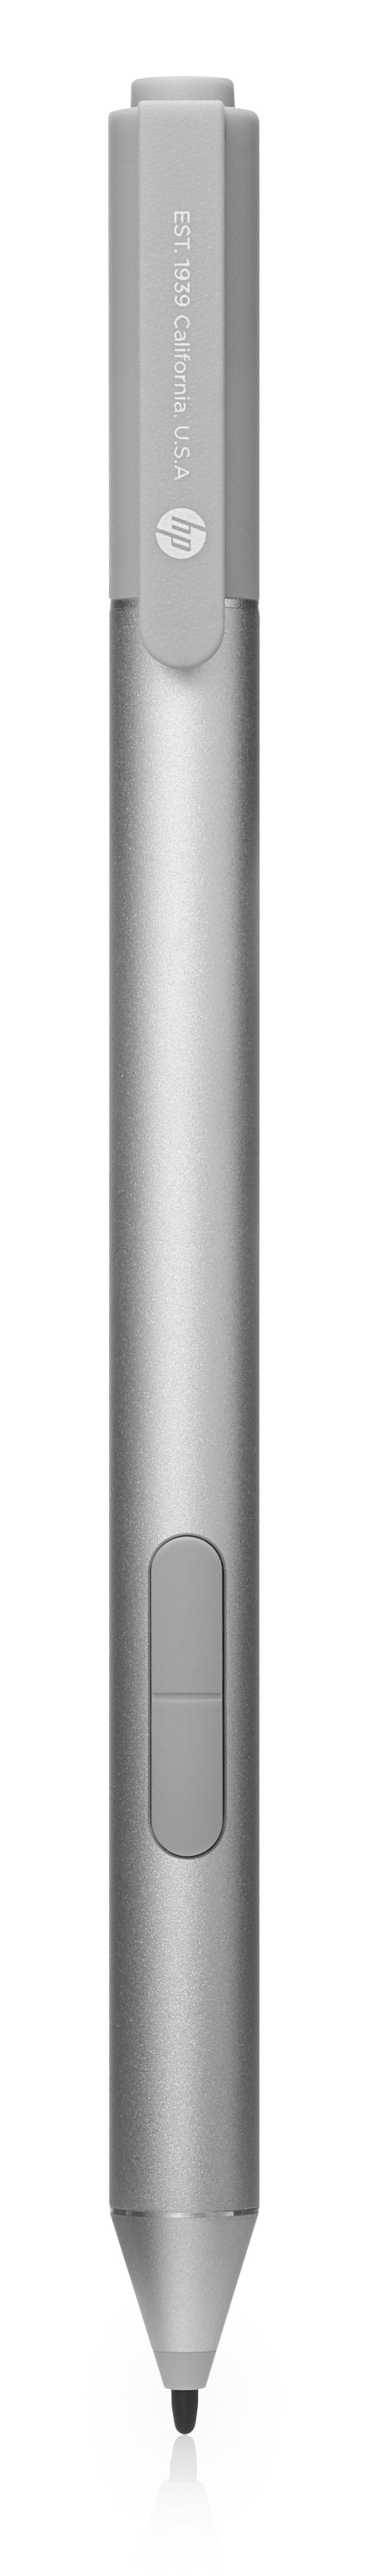 HP Pen Nib Set - stylus nib kit